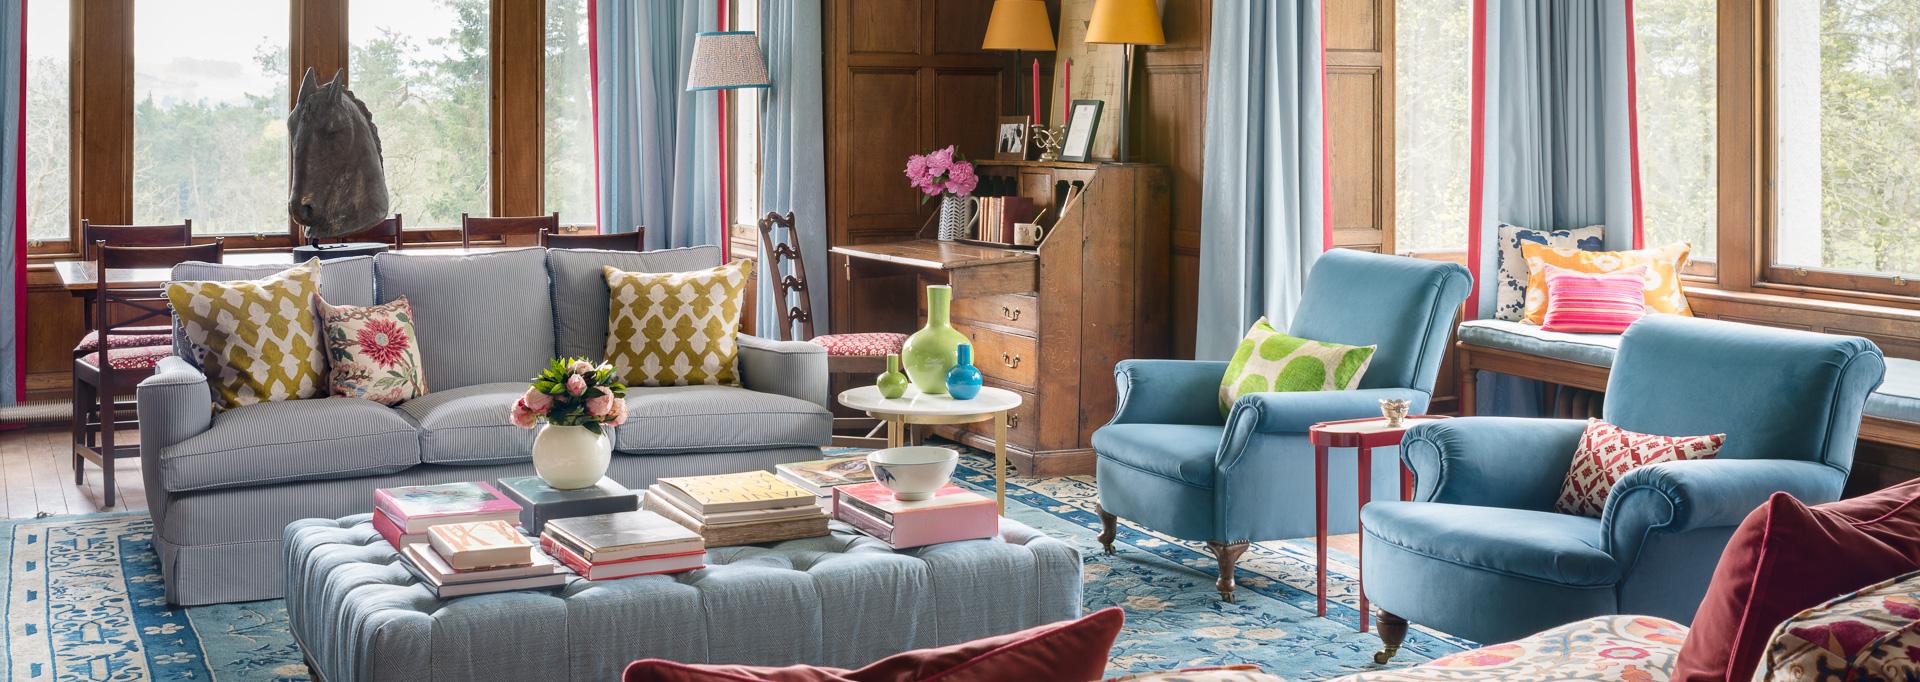 jessica buckley blue couched interior design